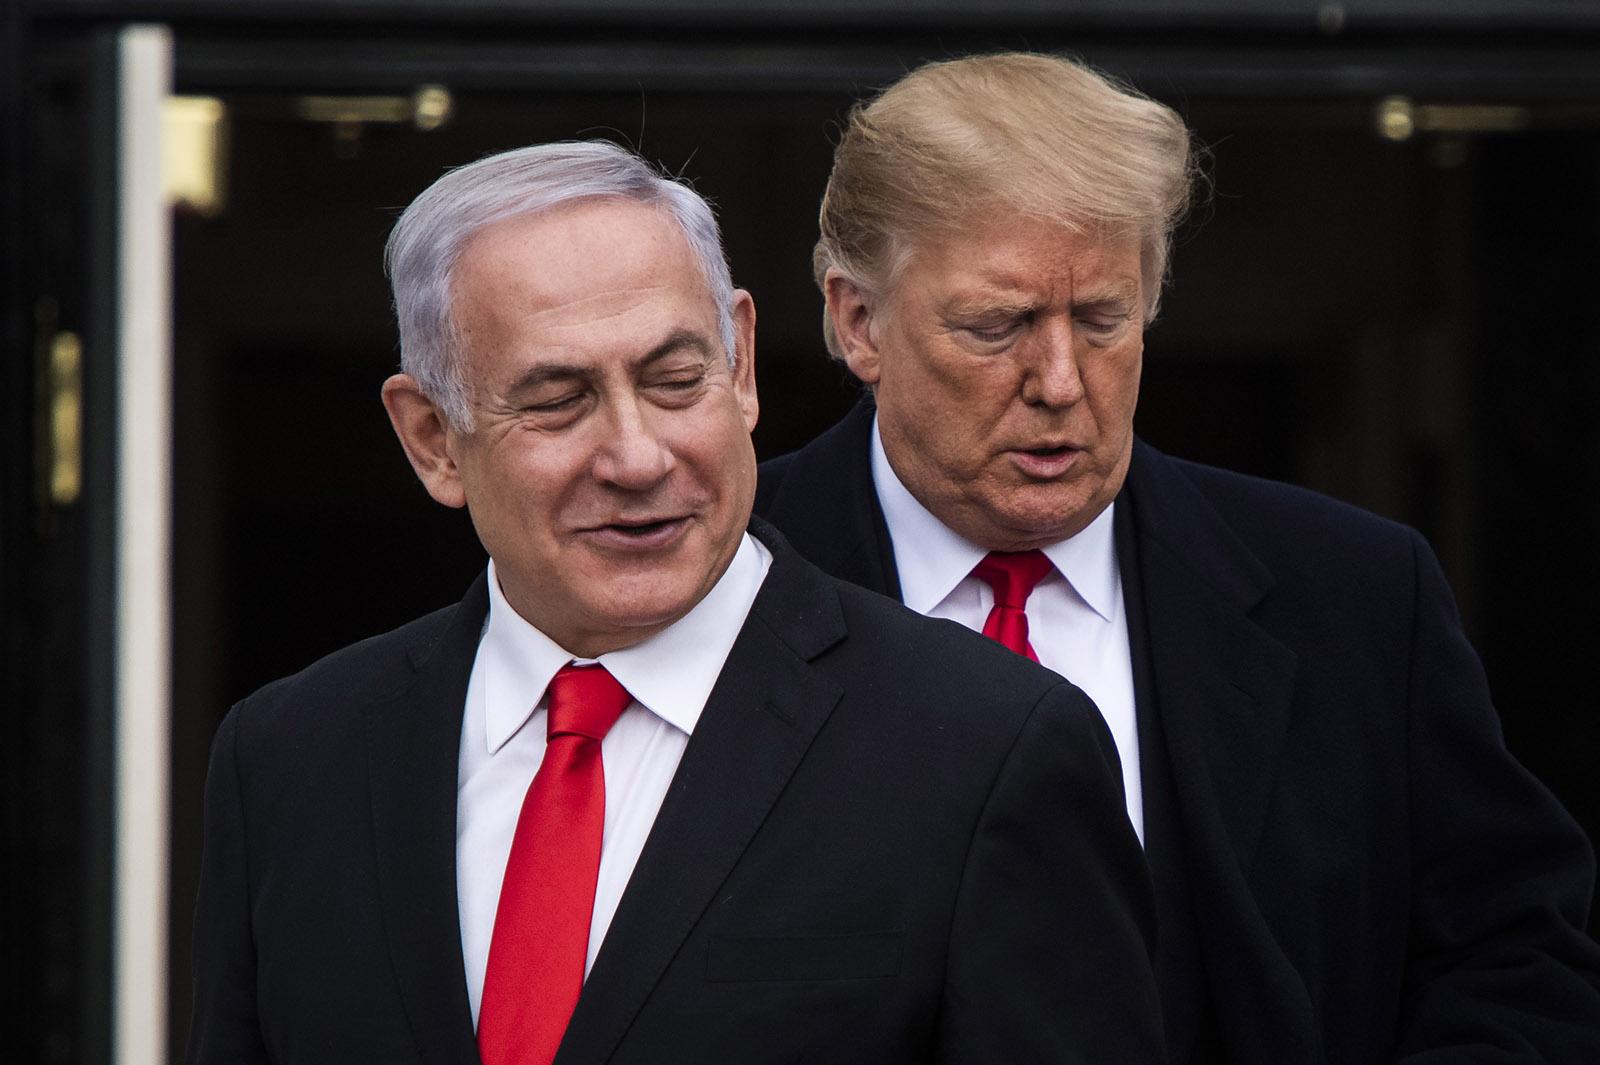 Israeli Prime Minister Benjamin Netanyahu with US President Donald Trump at the White House, Washington, D.C., March 25, 2019